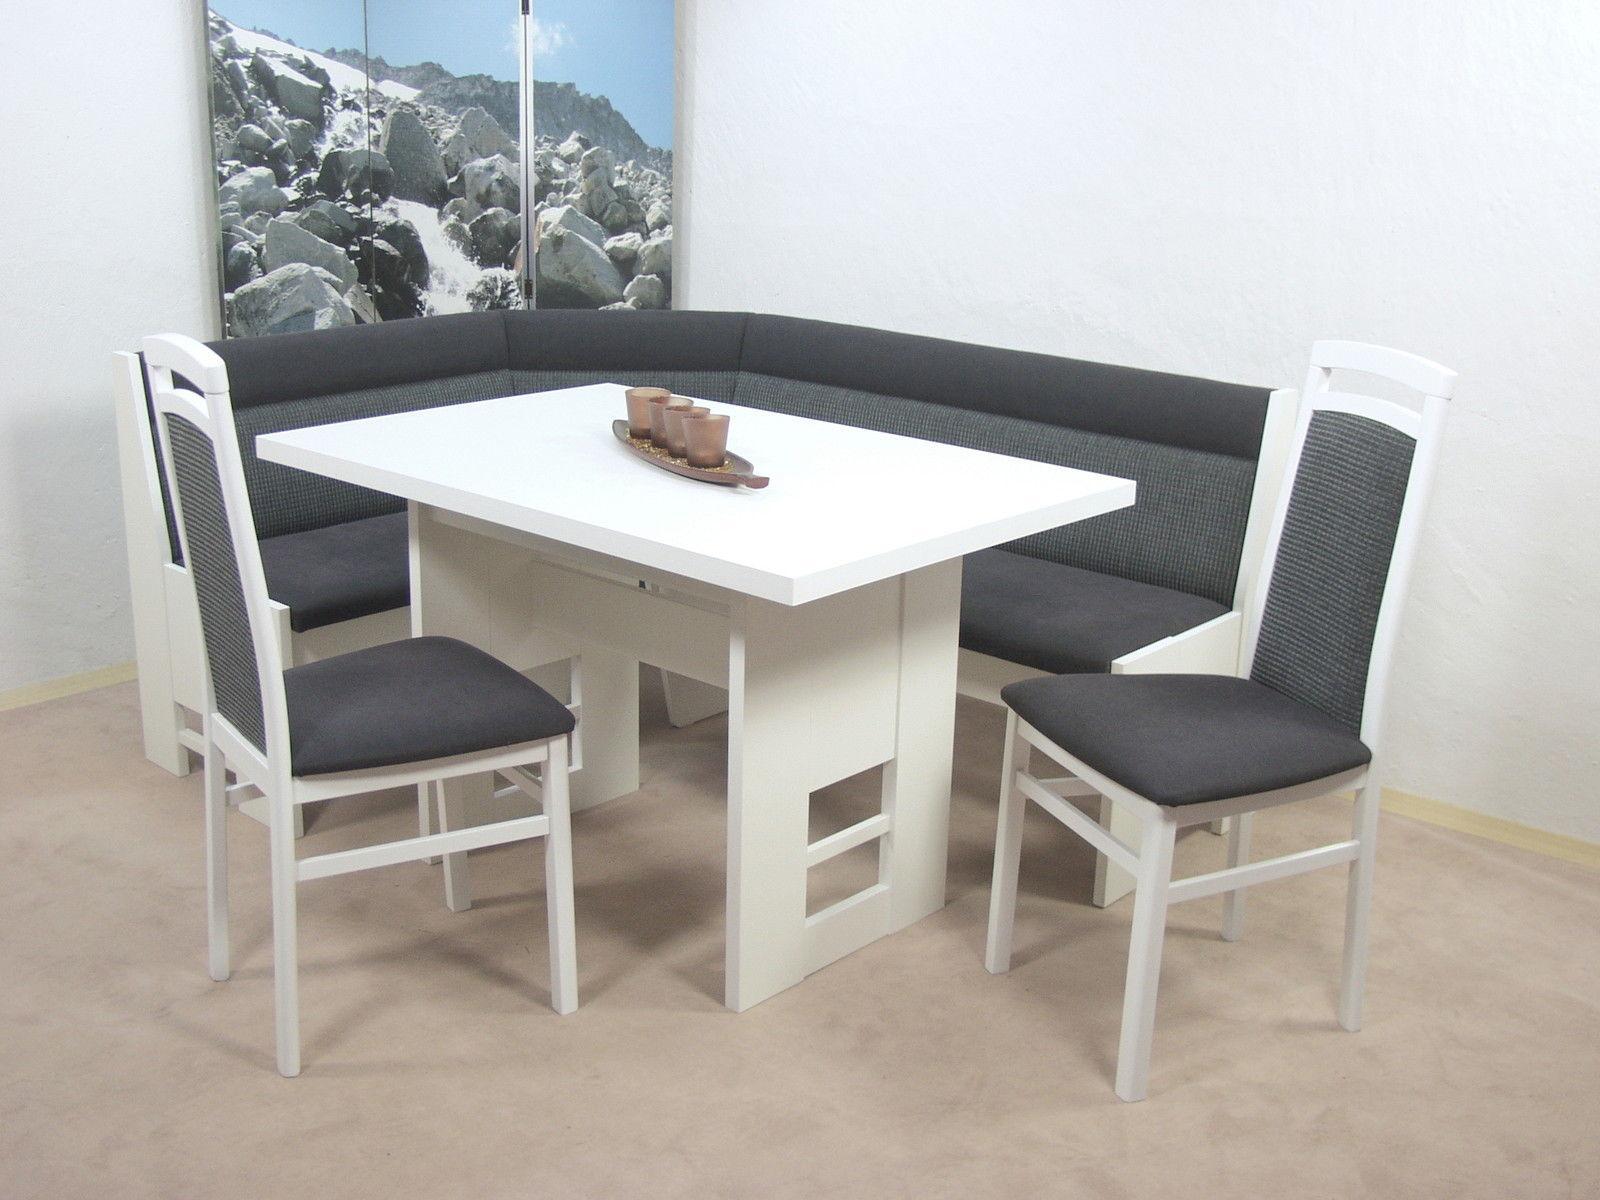 Eckbank weiß grau  Truheneckbankgruppe 4 teilig weiß grau Stühle Tisch Eckbank ...